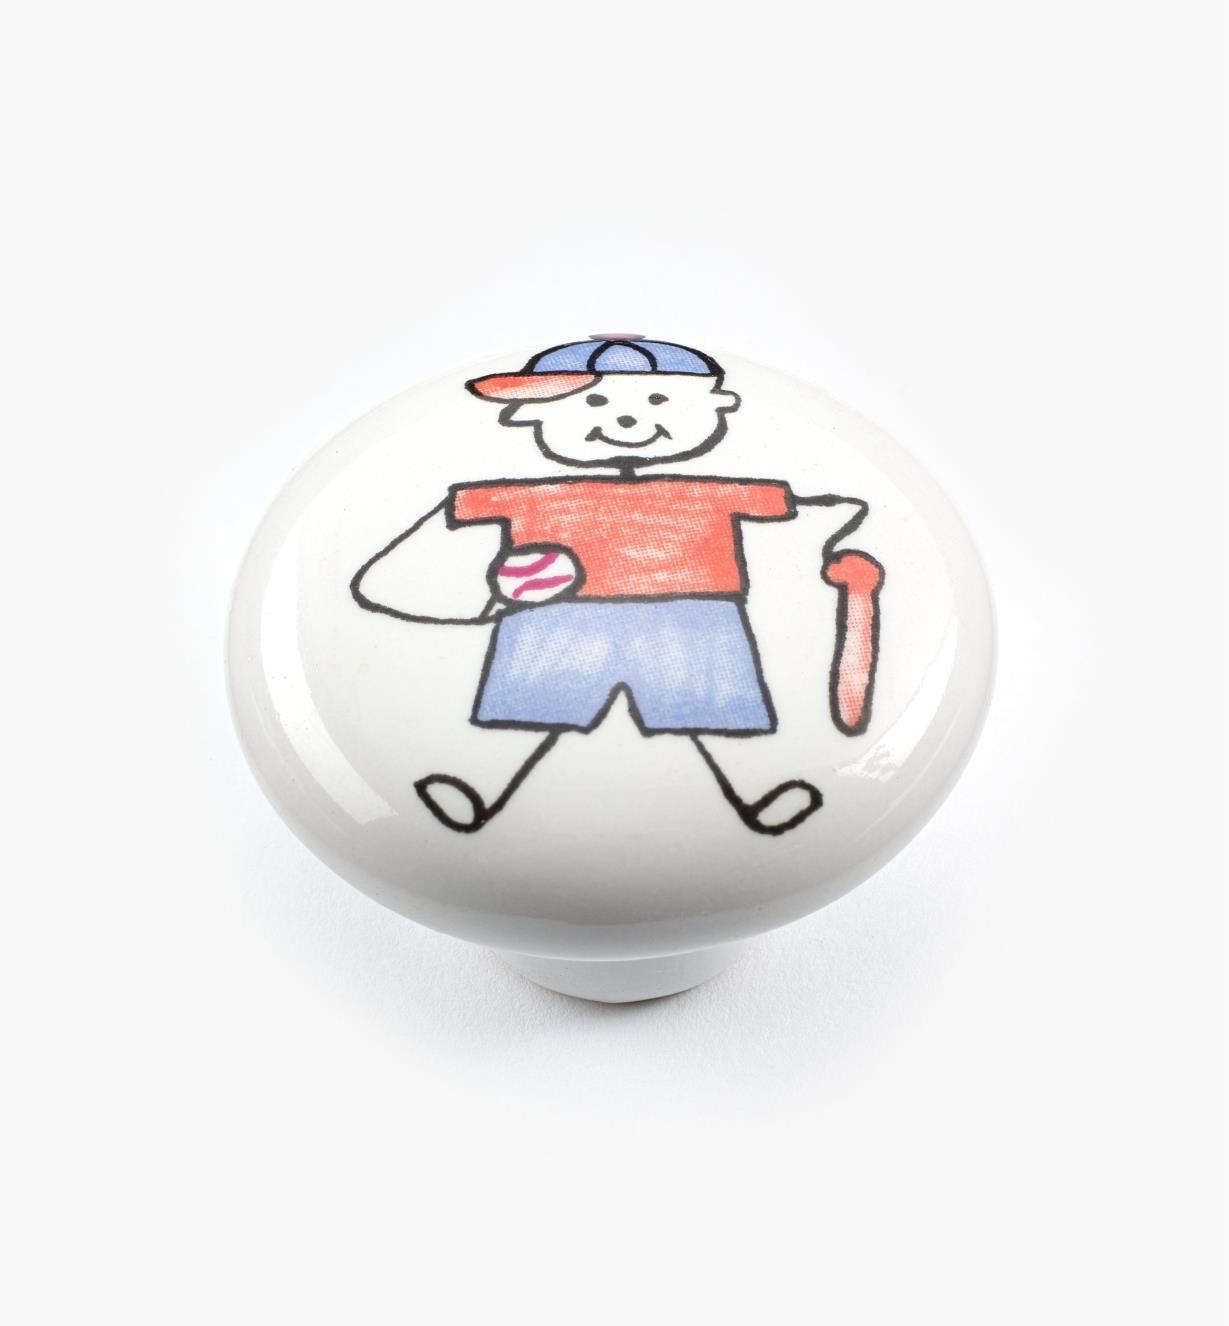 00W5313 - Baseball Knob